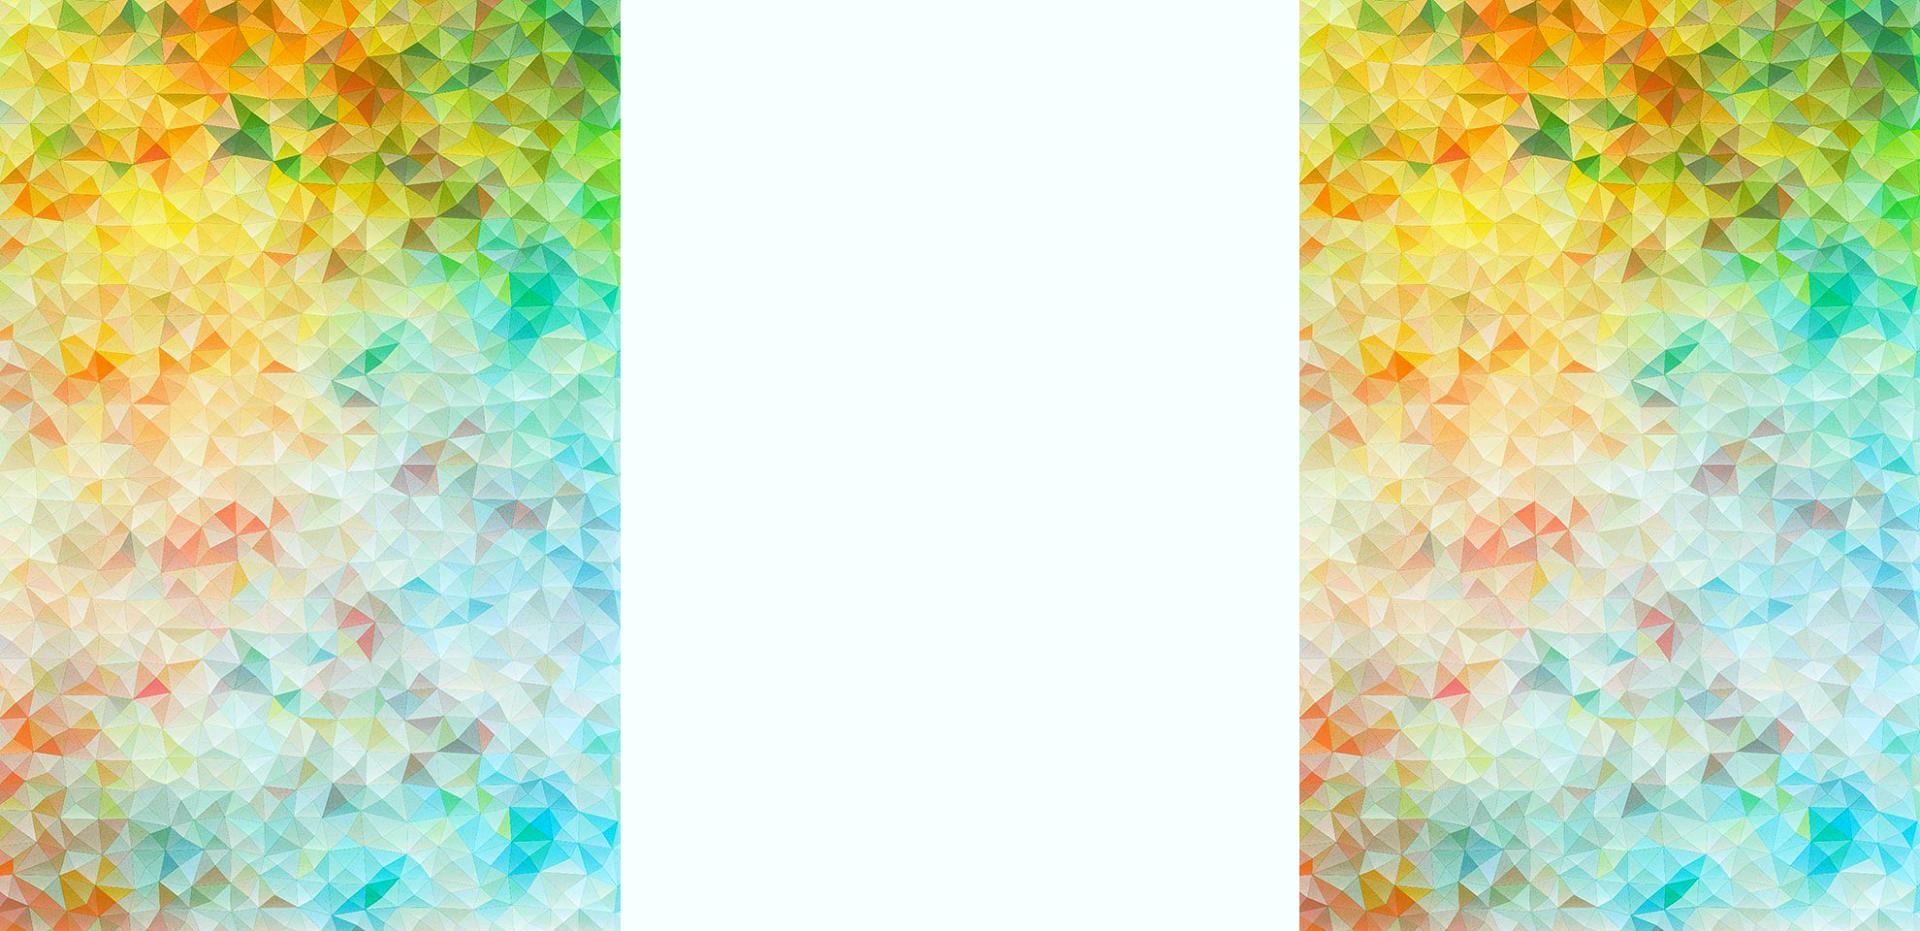 bg_textura03_edited.jpg